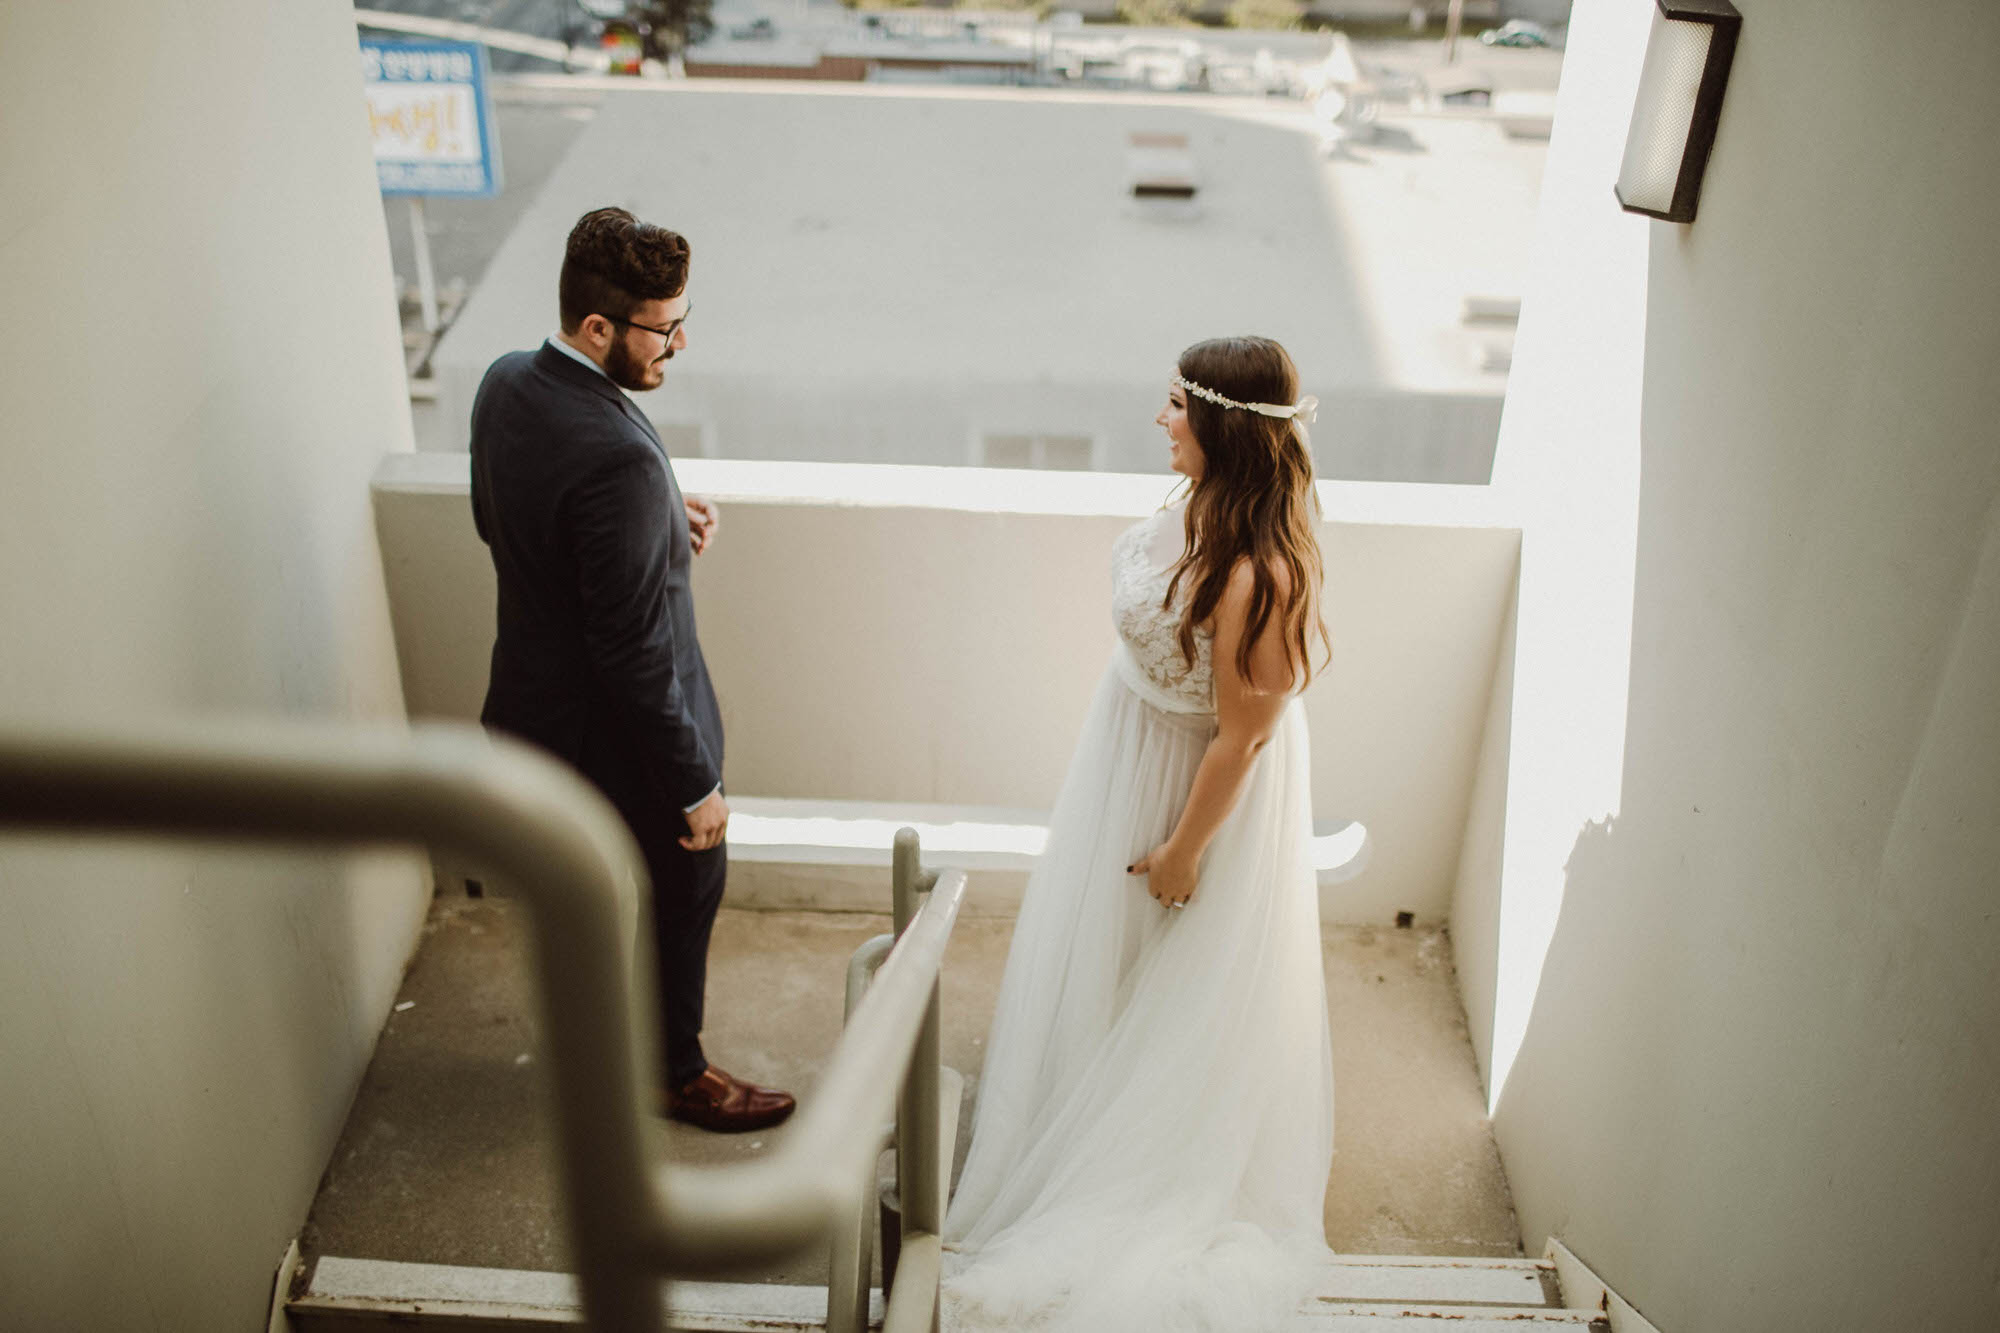 los-angeles-wedding-photographer-kristen-dylan-32.jpg